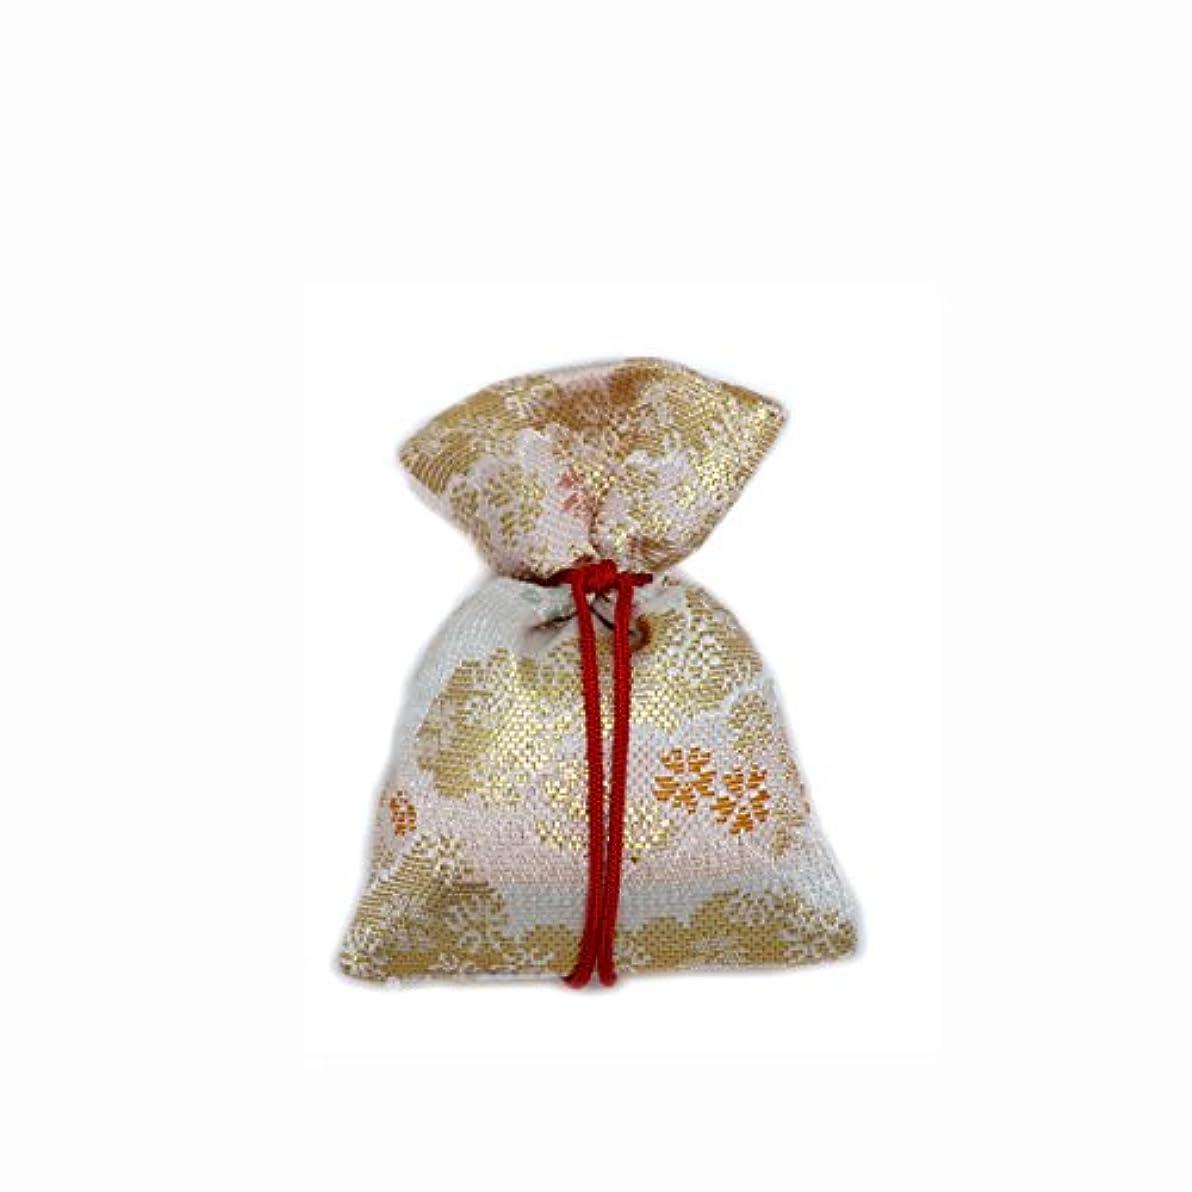 報復する有名認知匂袋 巾着 金襴中 白系